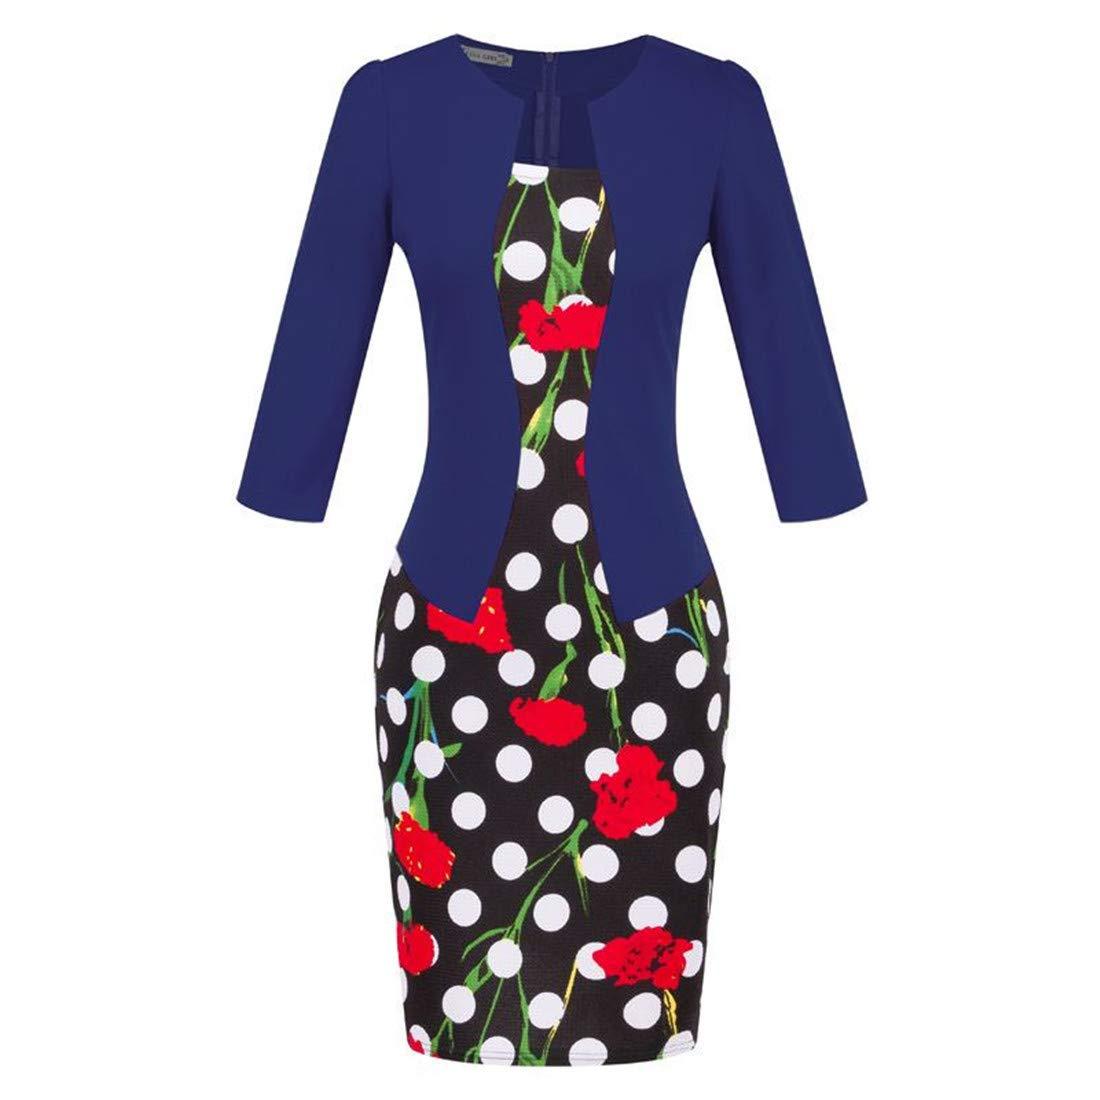 DUHUD Women's Vintage 3/4 Sleeve Pencil Business Work Dress